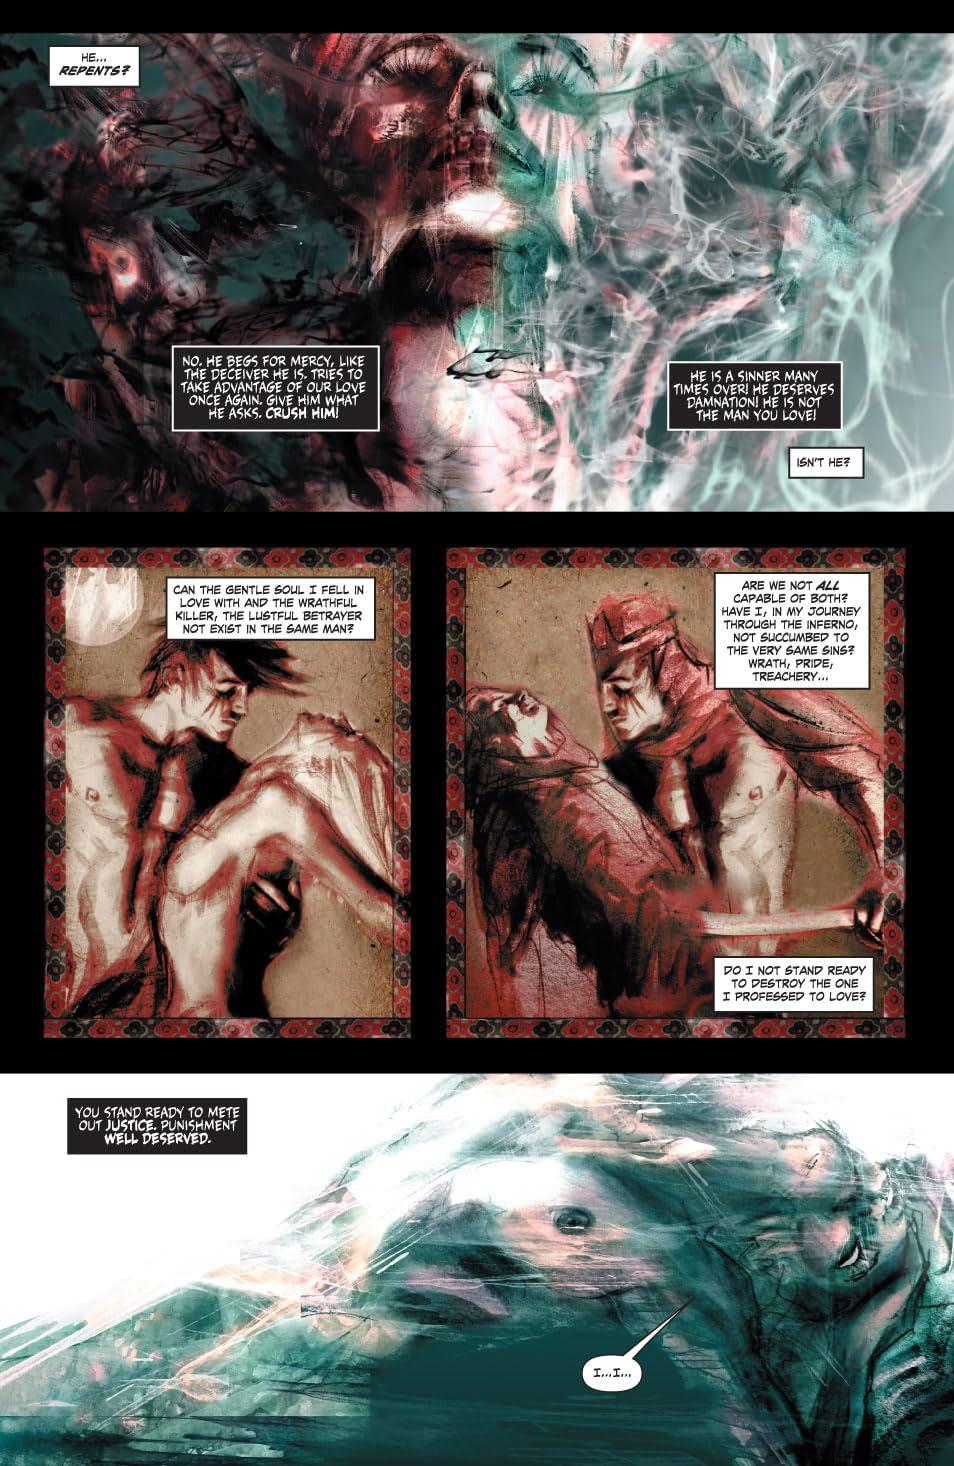 Dante's Inferno #6 (of 6)